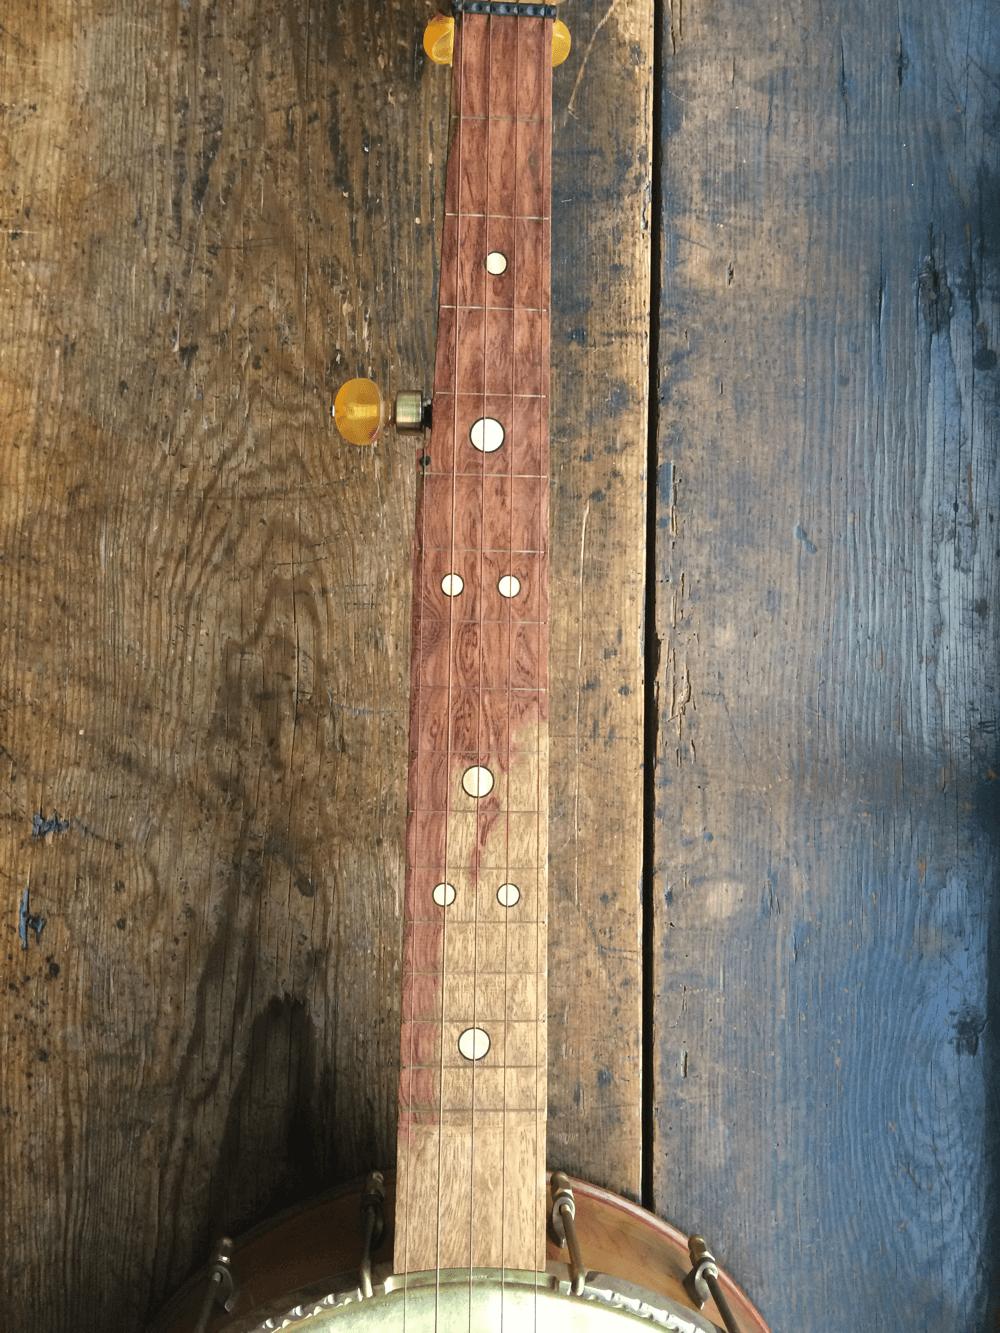 Scalloped fingerboard in Bubinga heart and sap wood